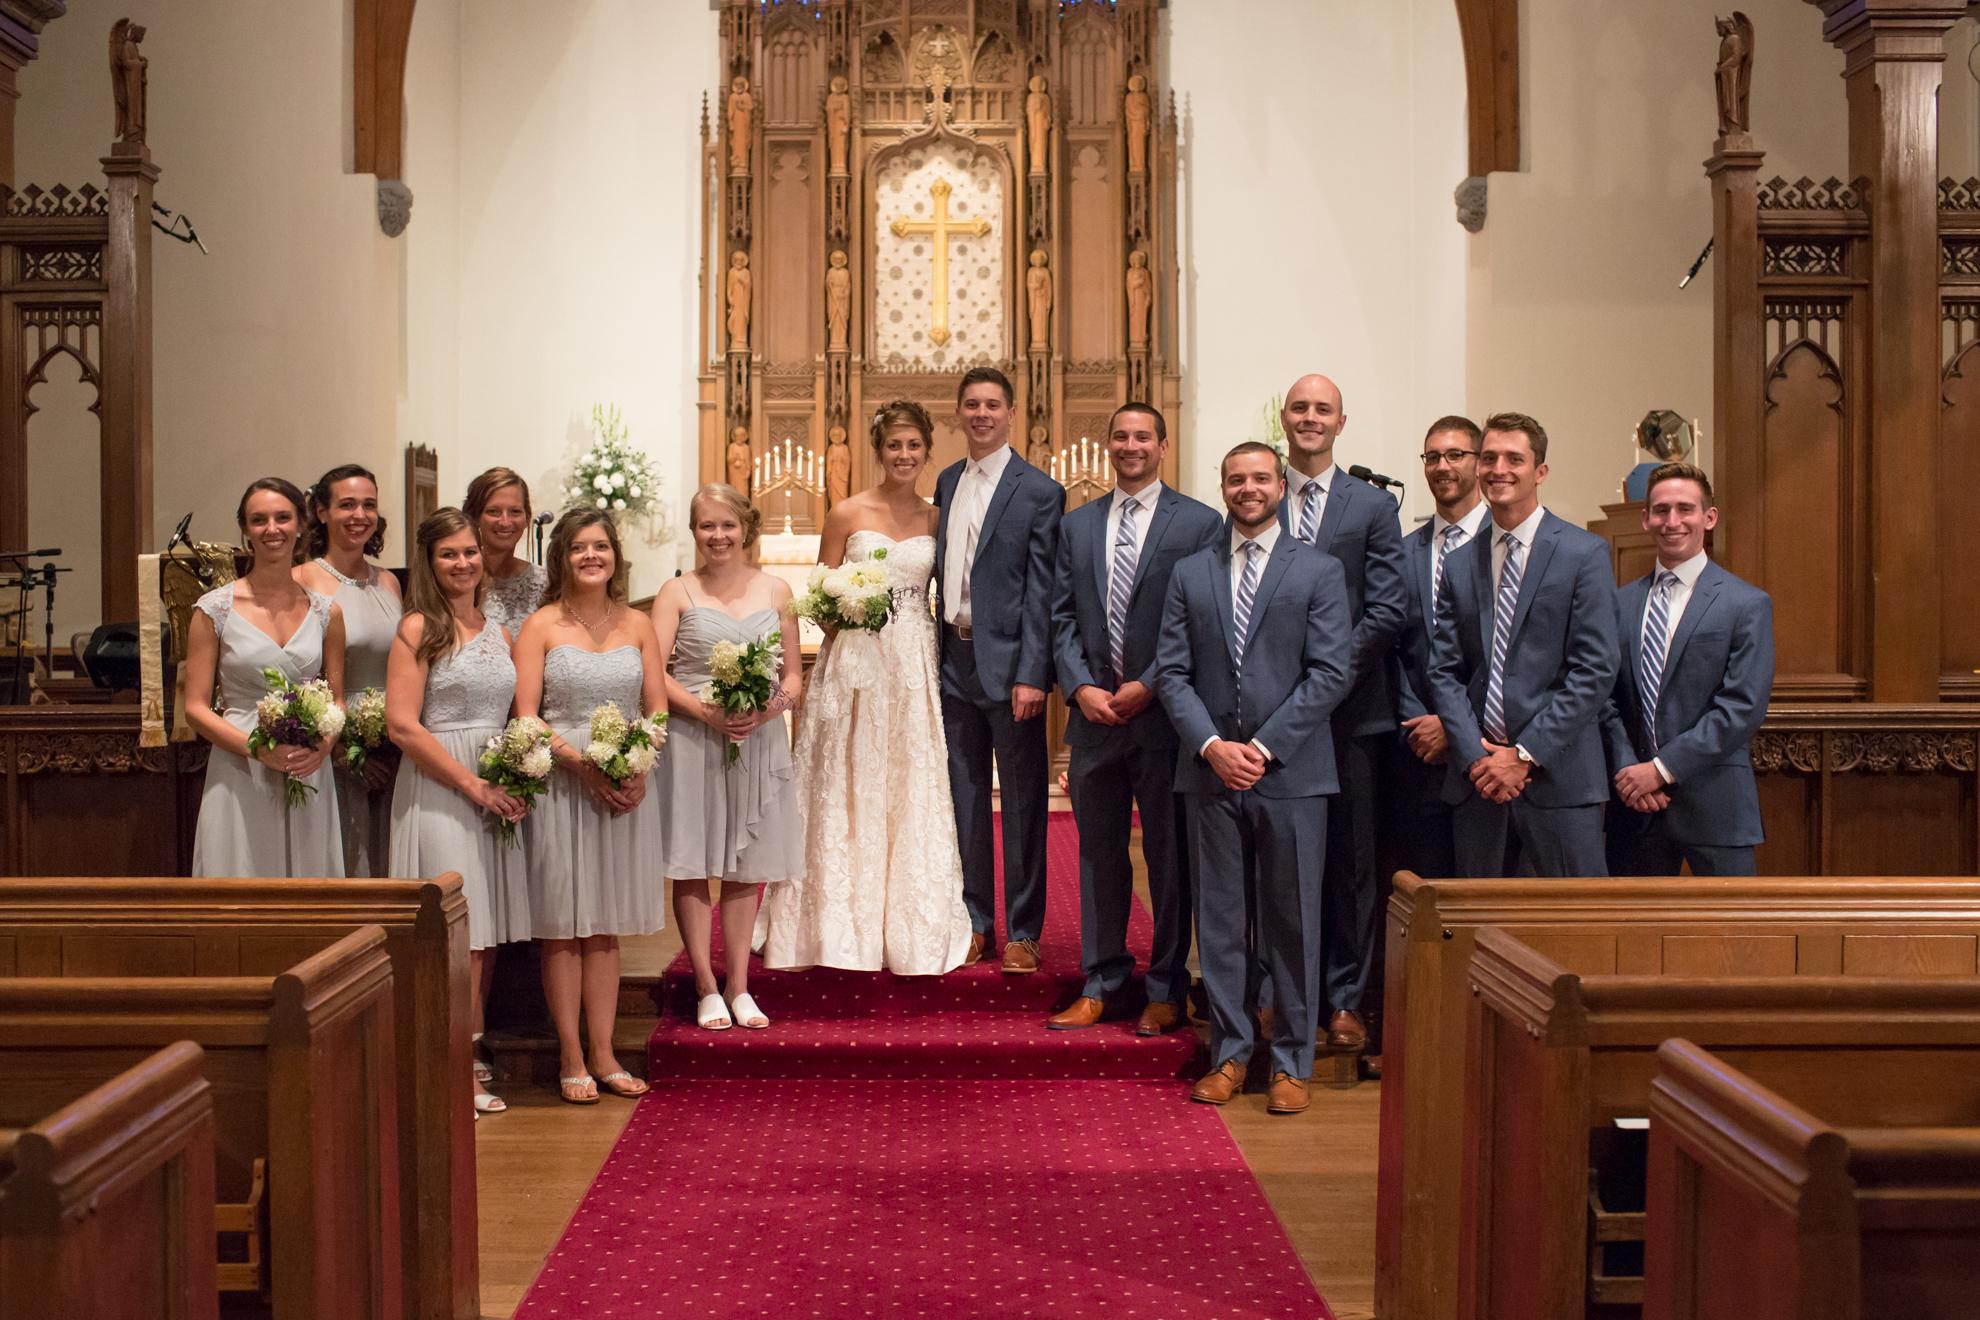 St-Stephen's-church-wedding